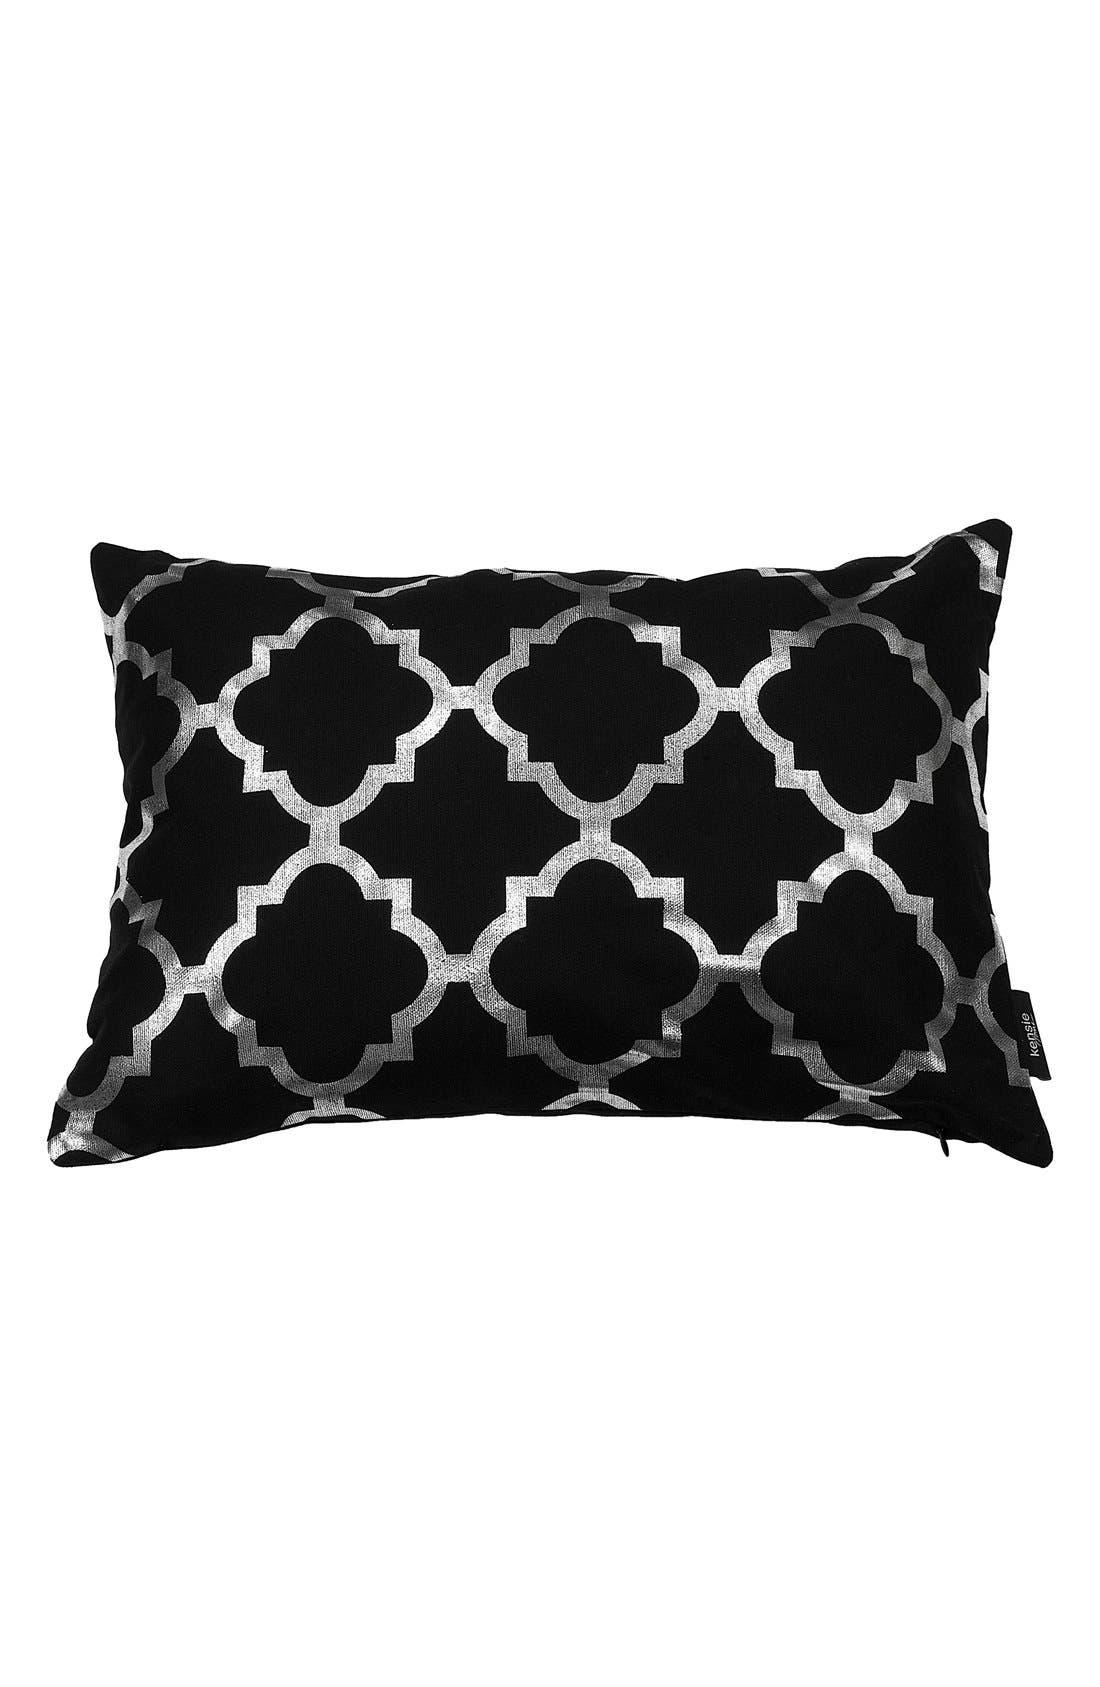 'Holly' Metallic Lattice Pillow,                             Main thumbnail 1, color,                             Black/ Silver